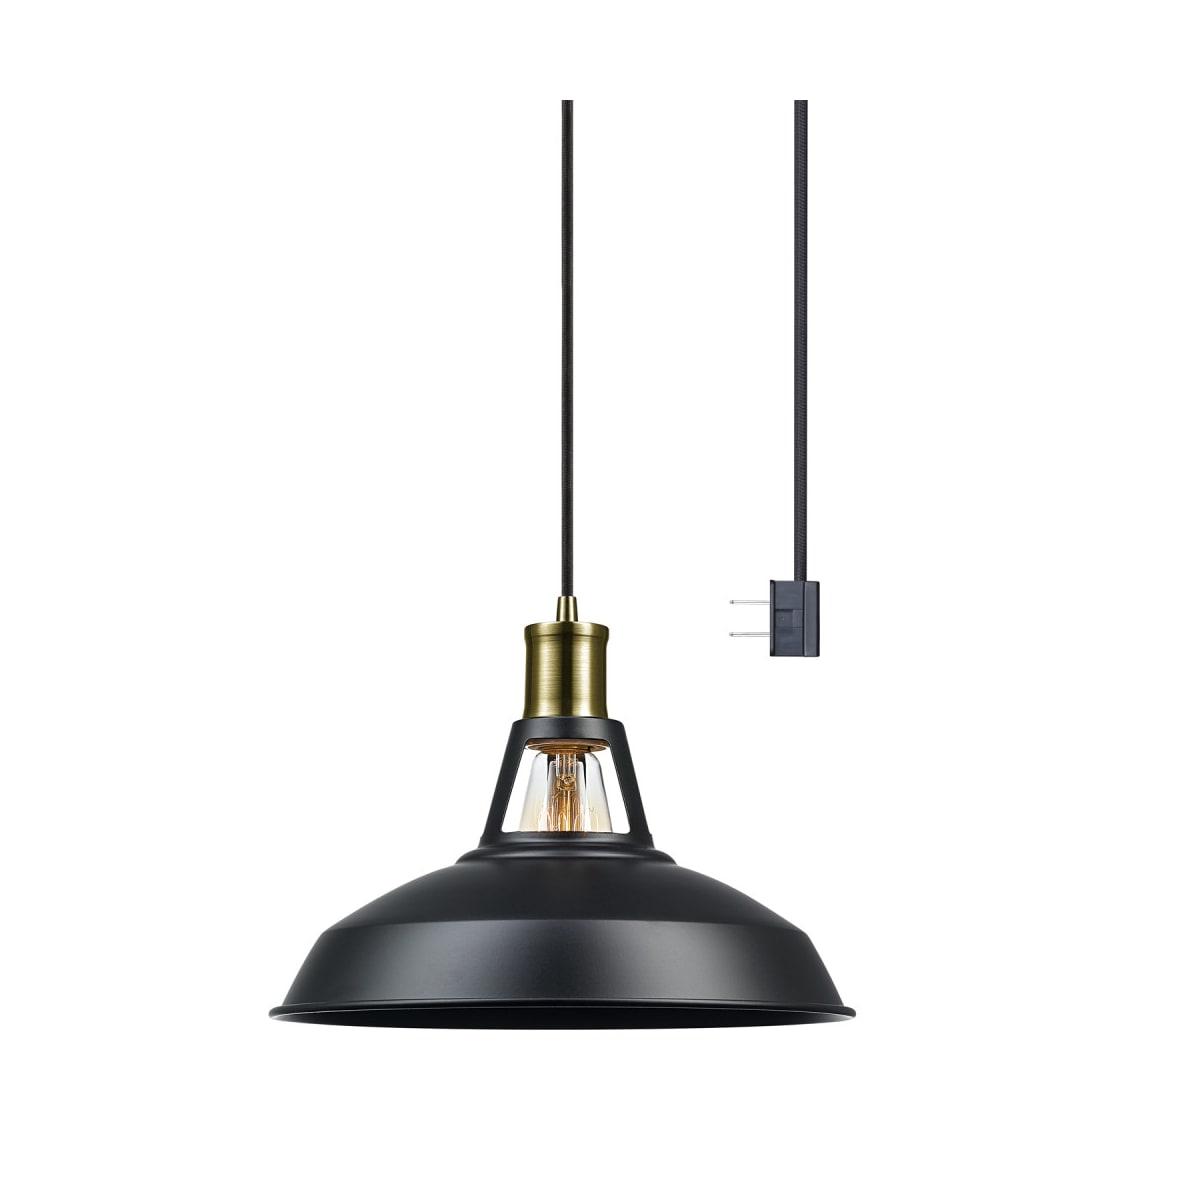 Globe Electric 65712 Satin Black Robin 1 Light Plug In Or Hardwire Pendant With 15 Feet Black Woven Fabric Cord Lightingdirect Com